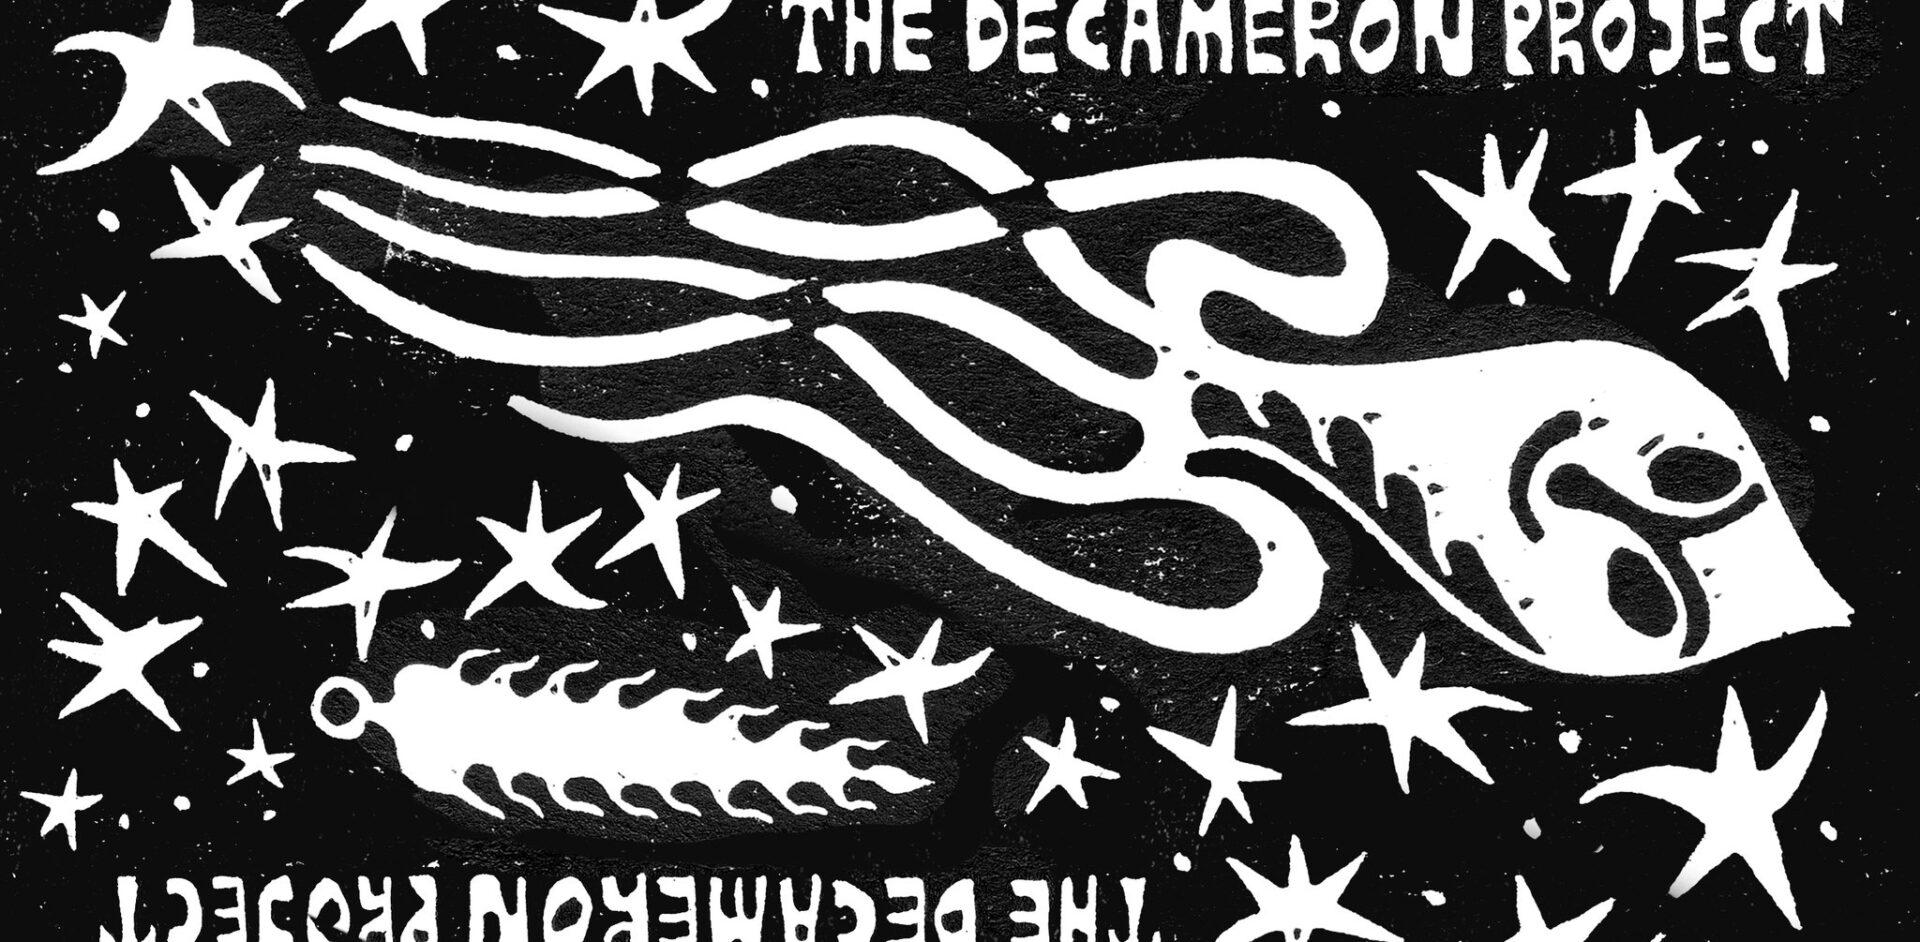 Decameron Weekly